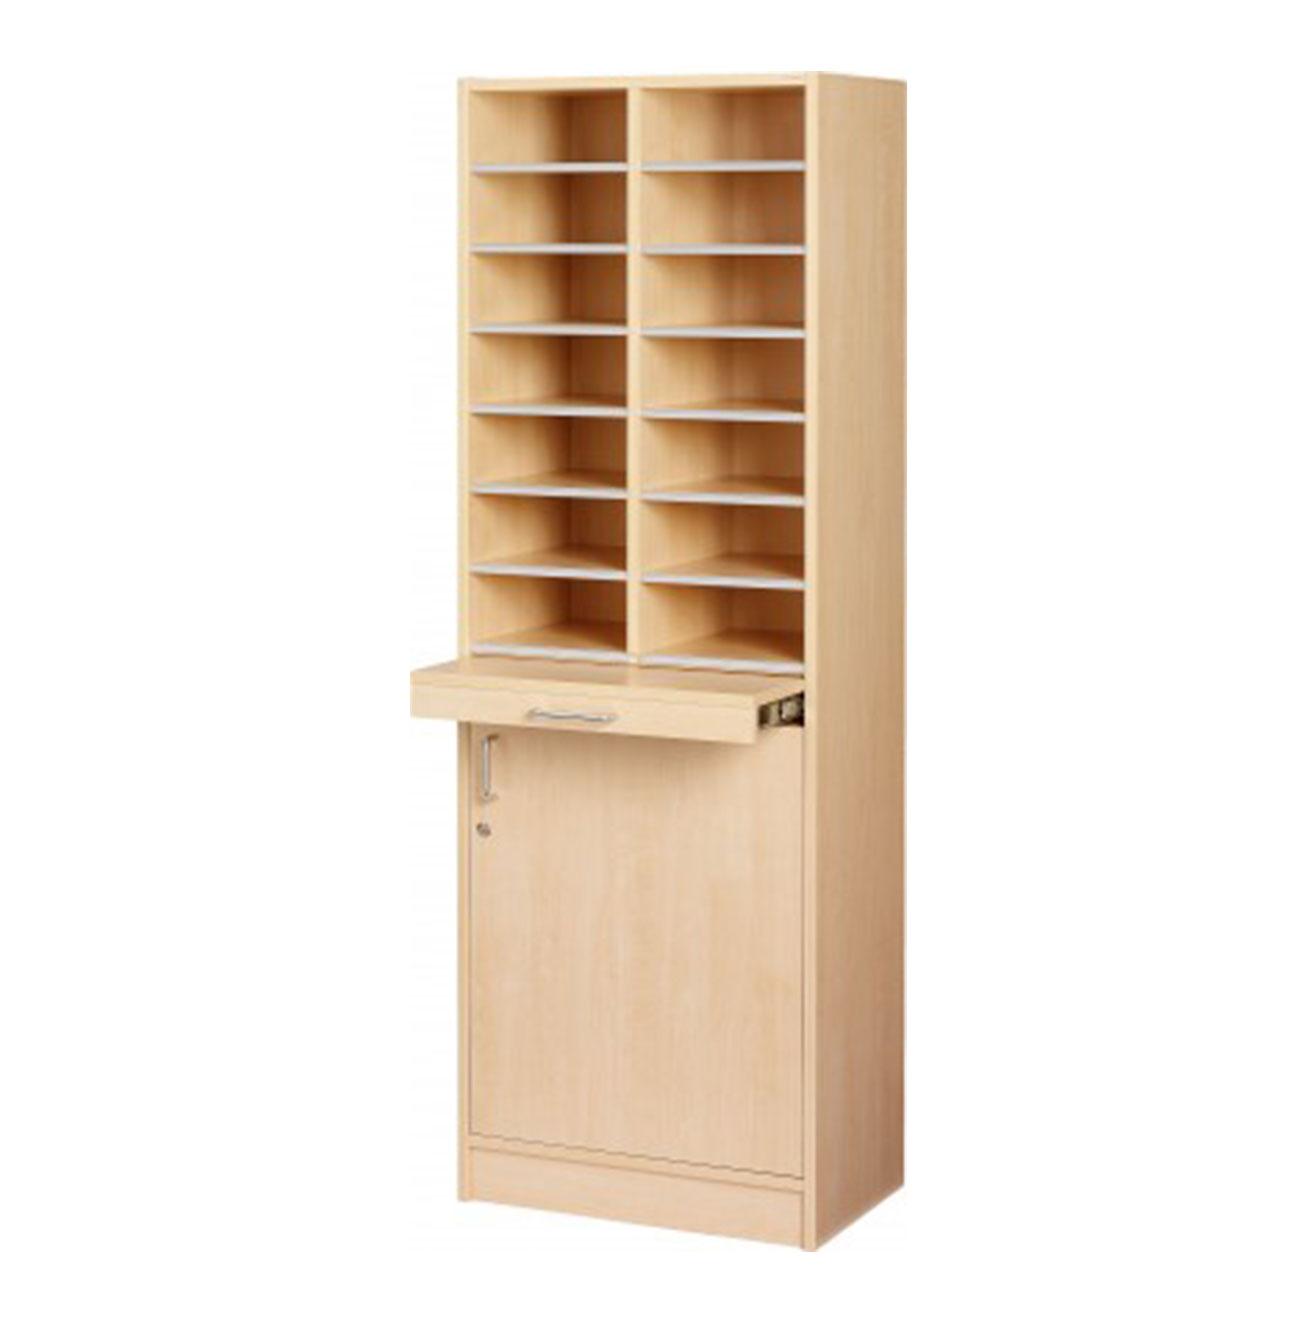 Floor Model - Pigeon Hole Cabinet - Birch